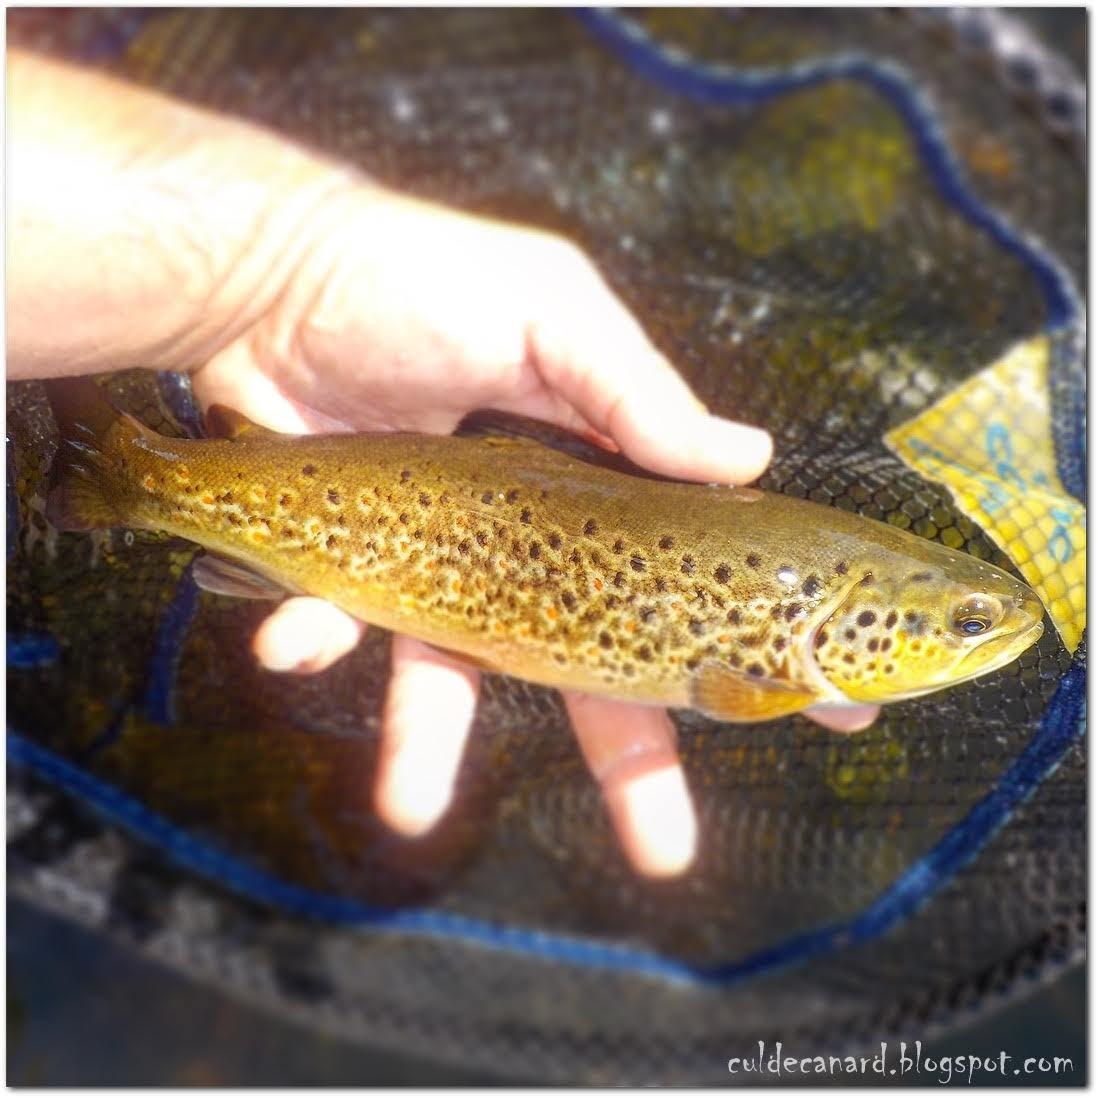 Cul de Canard - Fly Fishing Blog: Jornadas de agosto